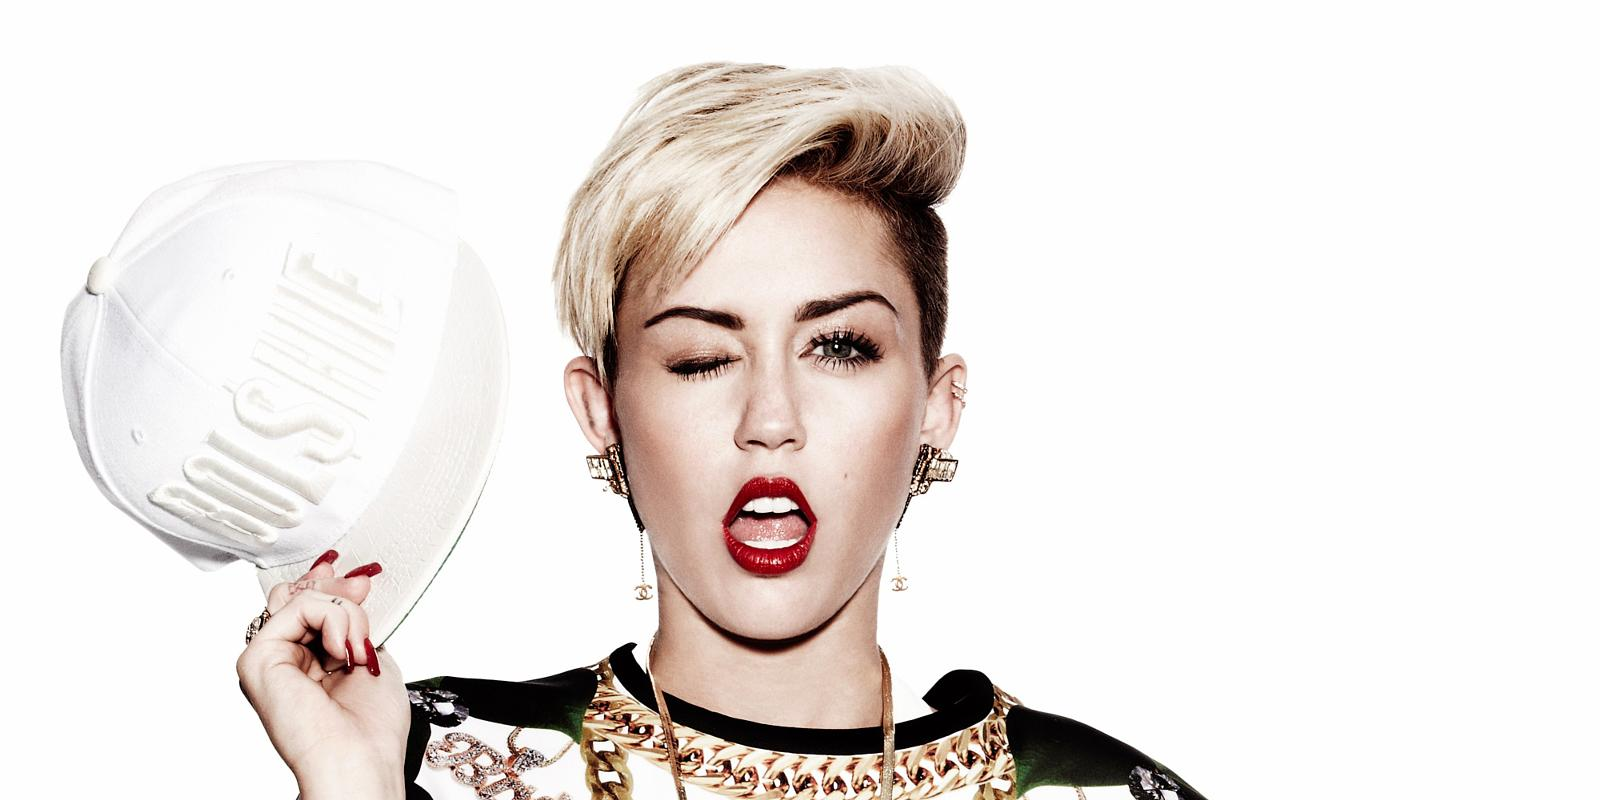 Miley cyrus voyeur holy book